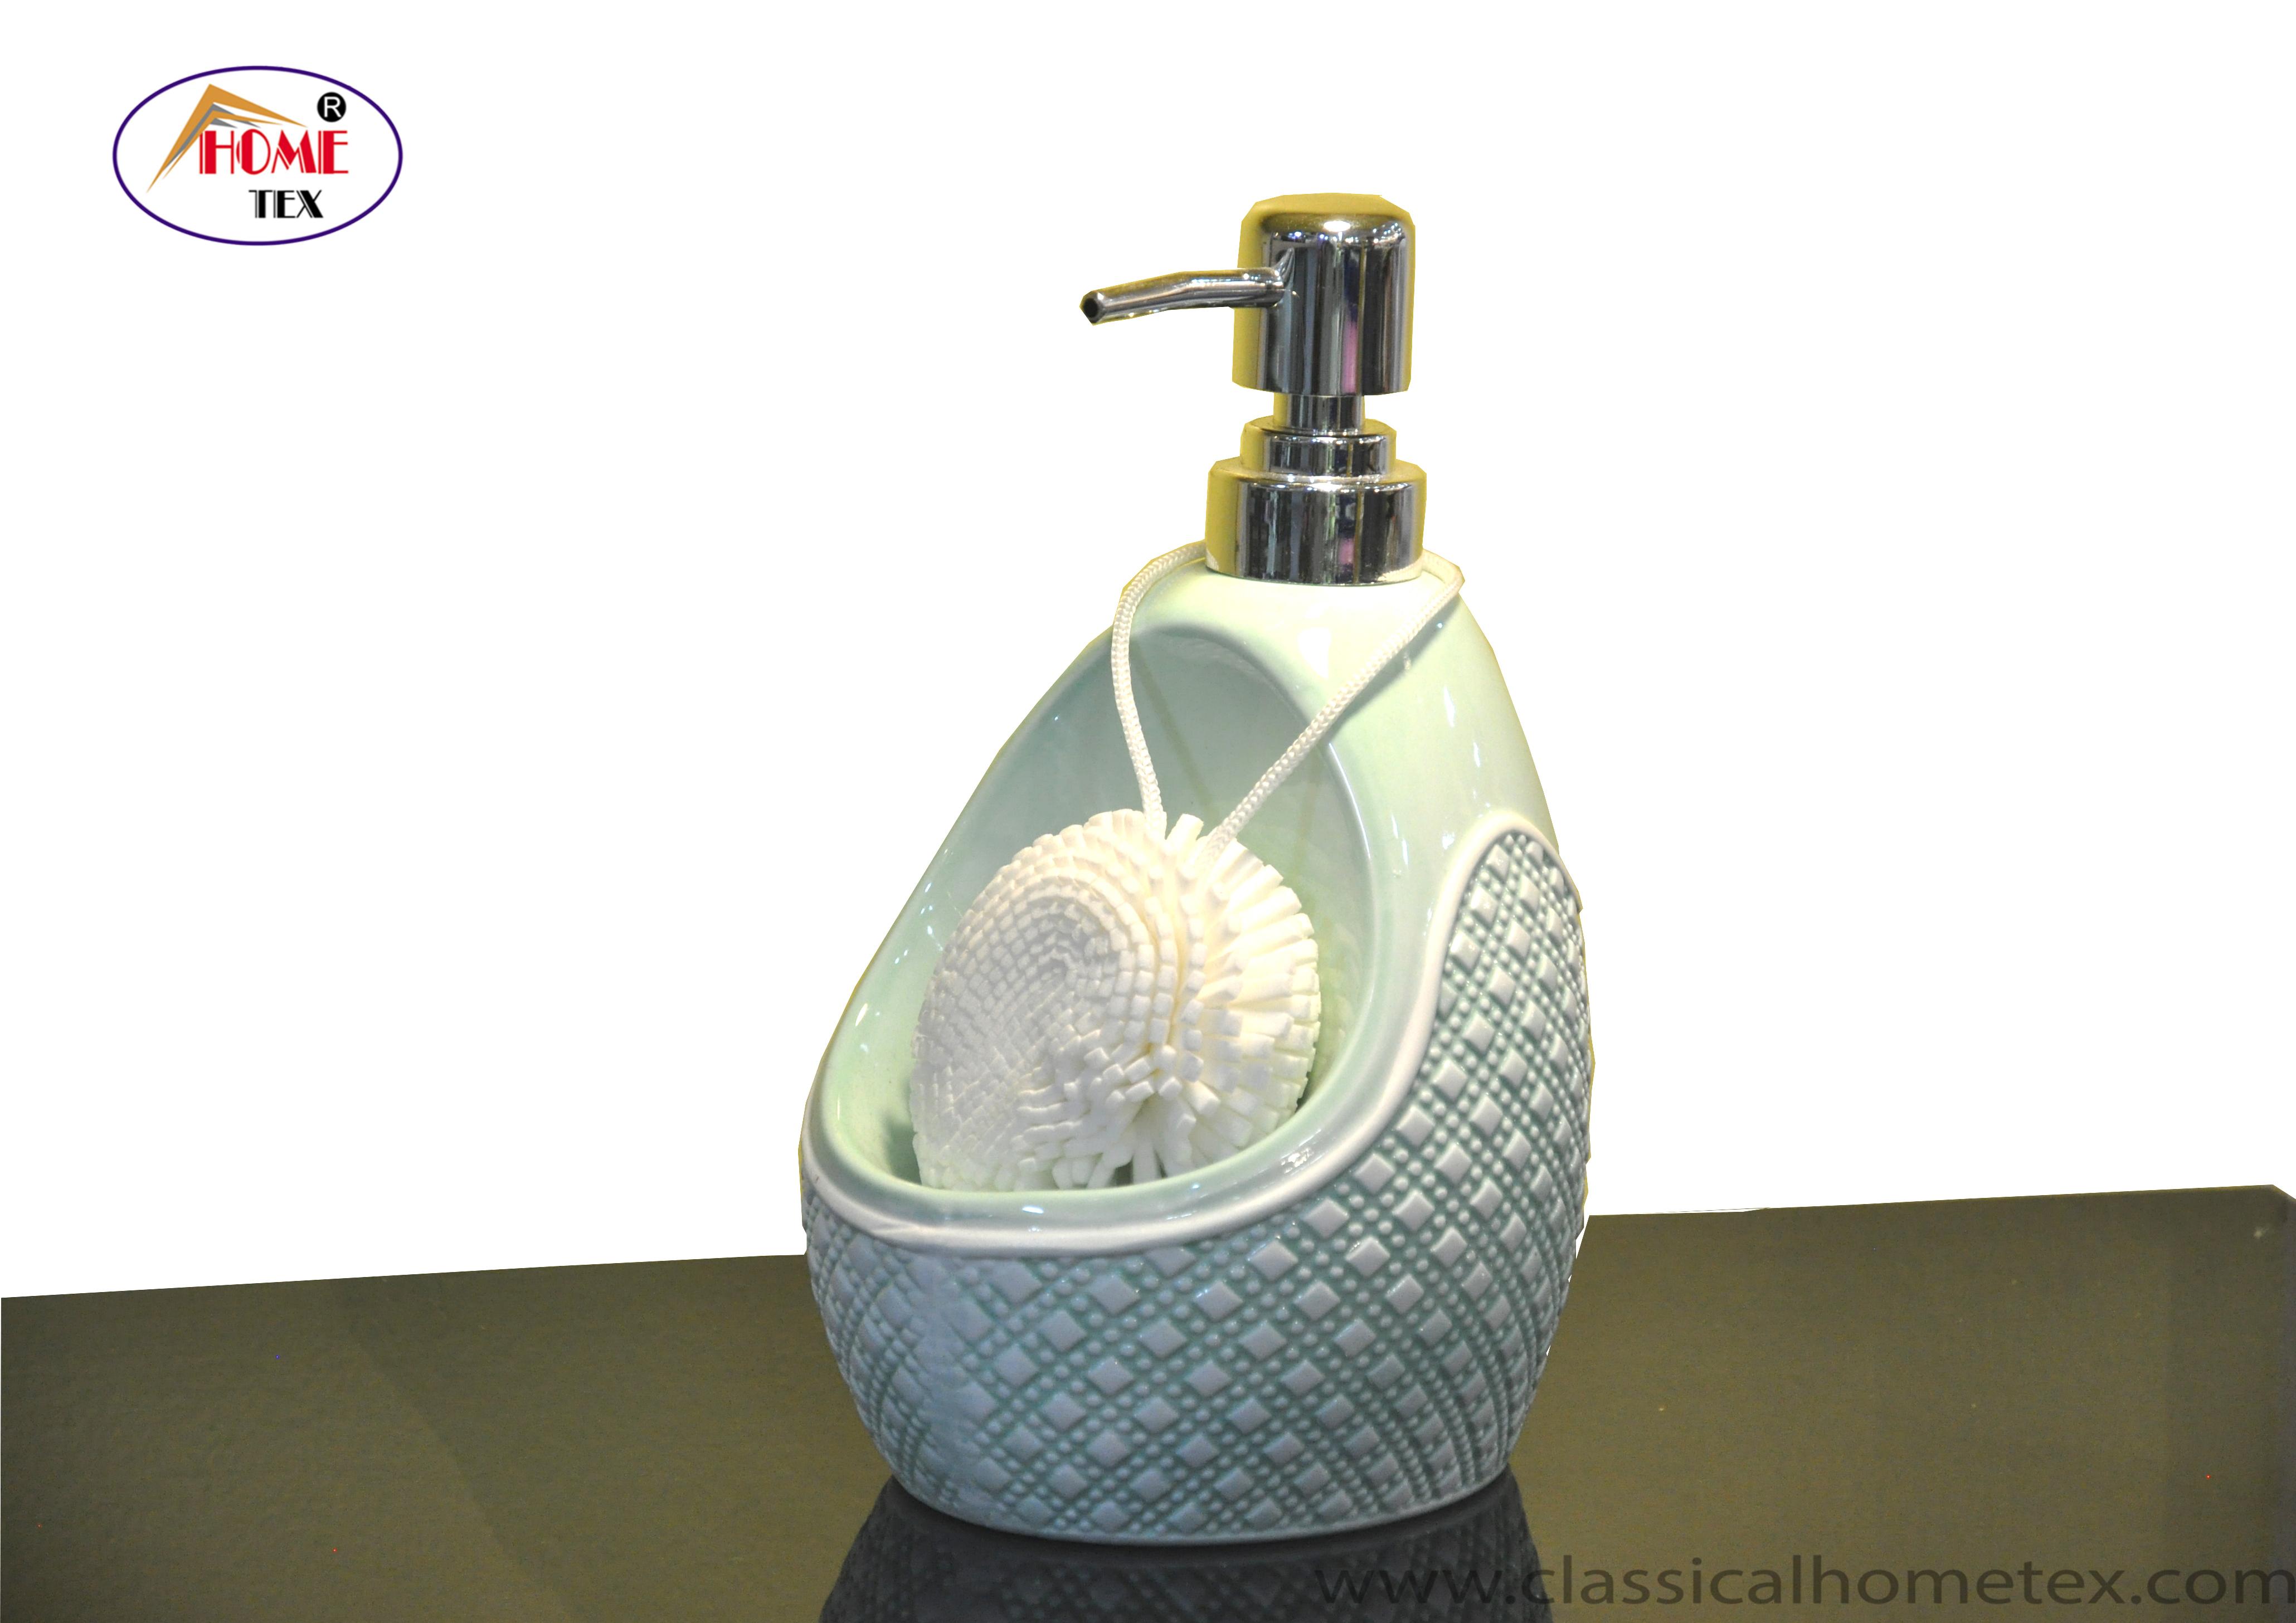 Bathroom Accessories online in Bangladesh - Classical Hometex Ind. Ltd.